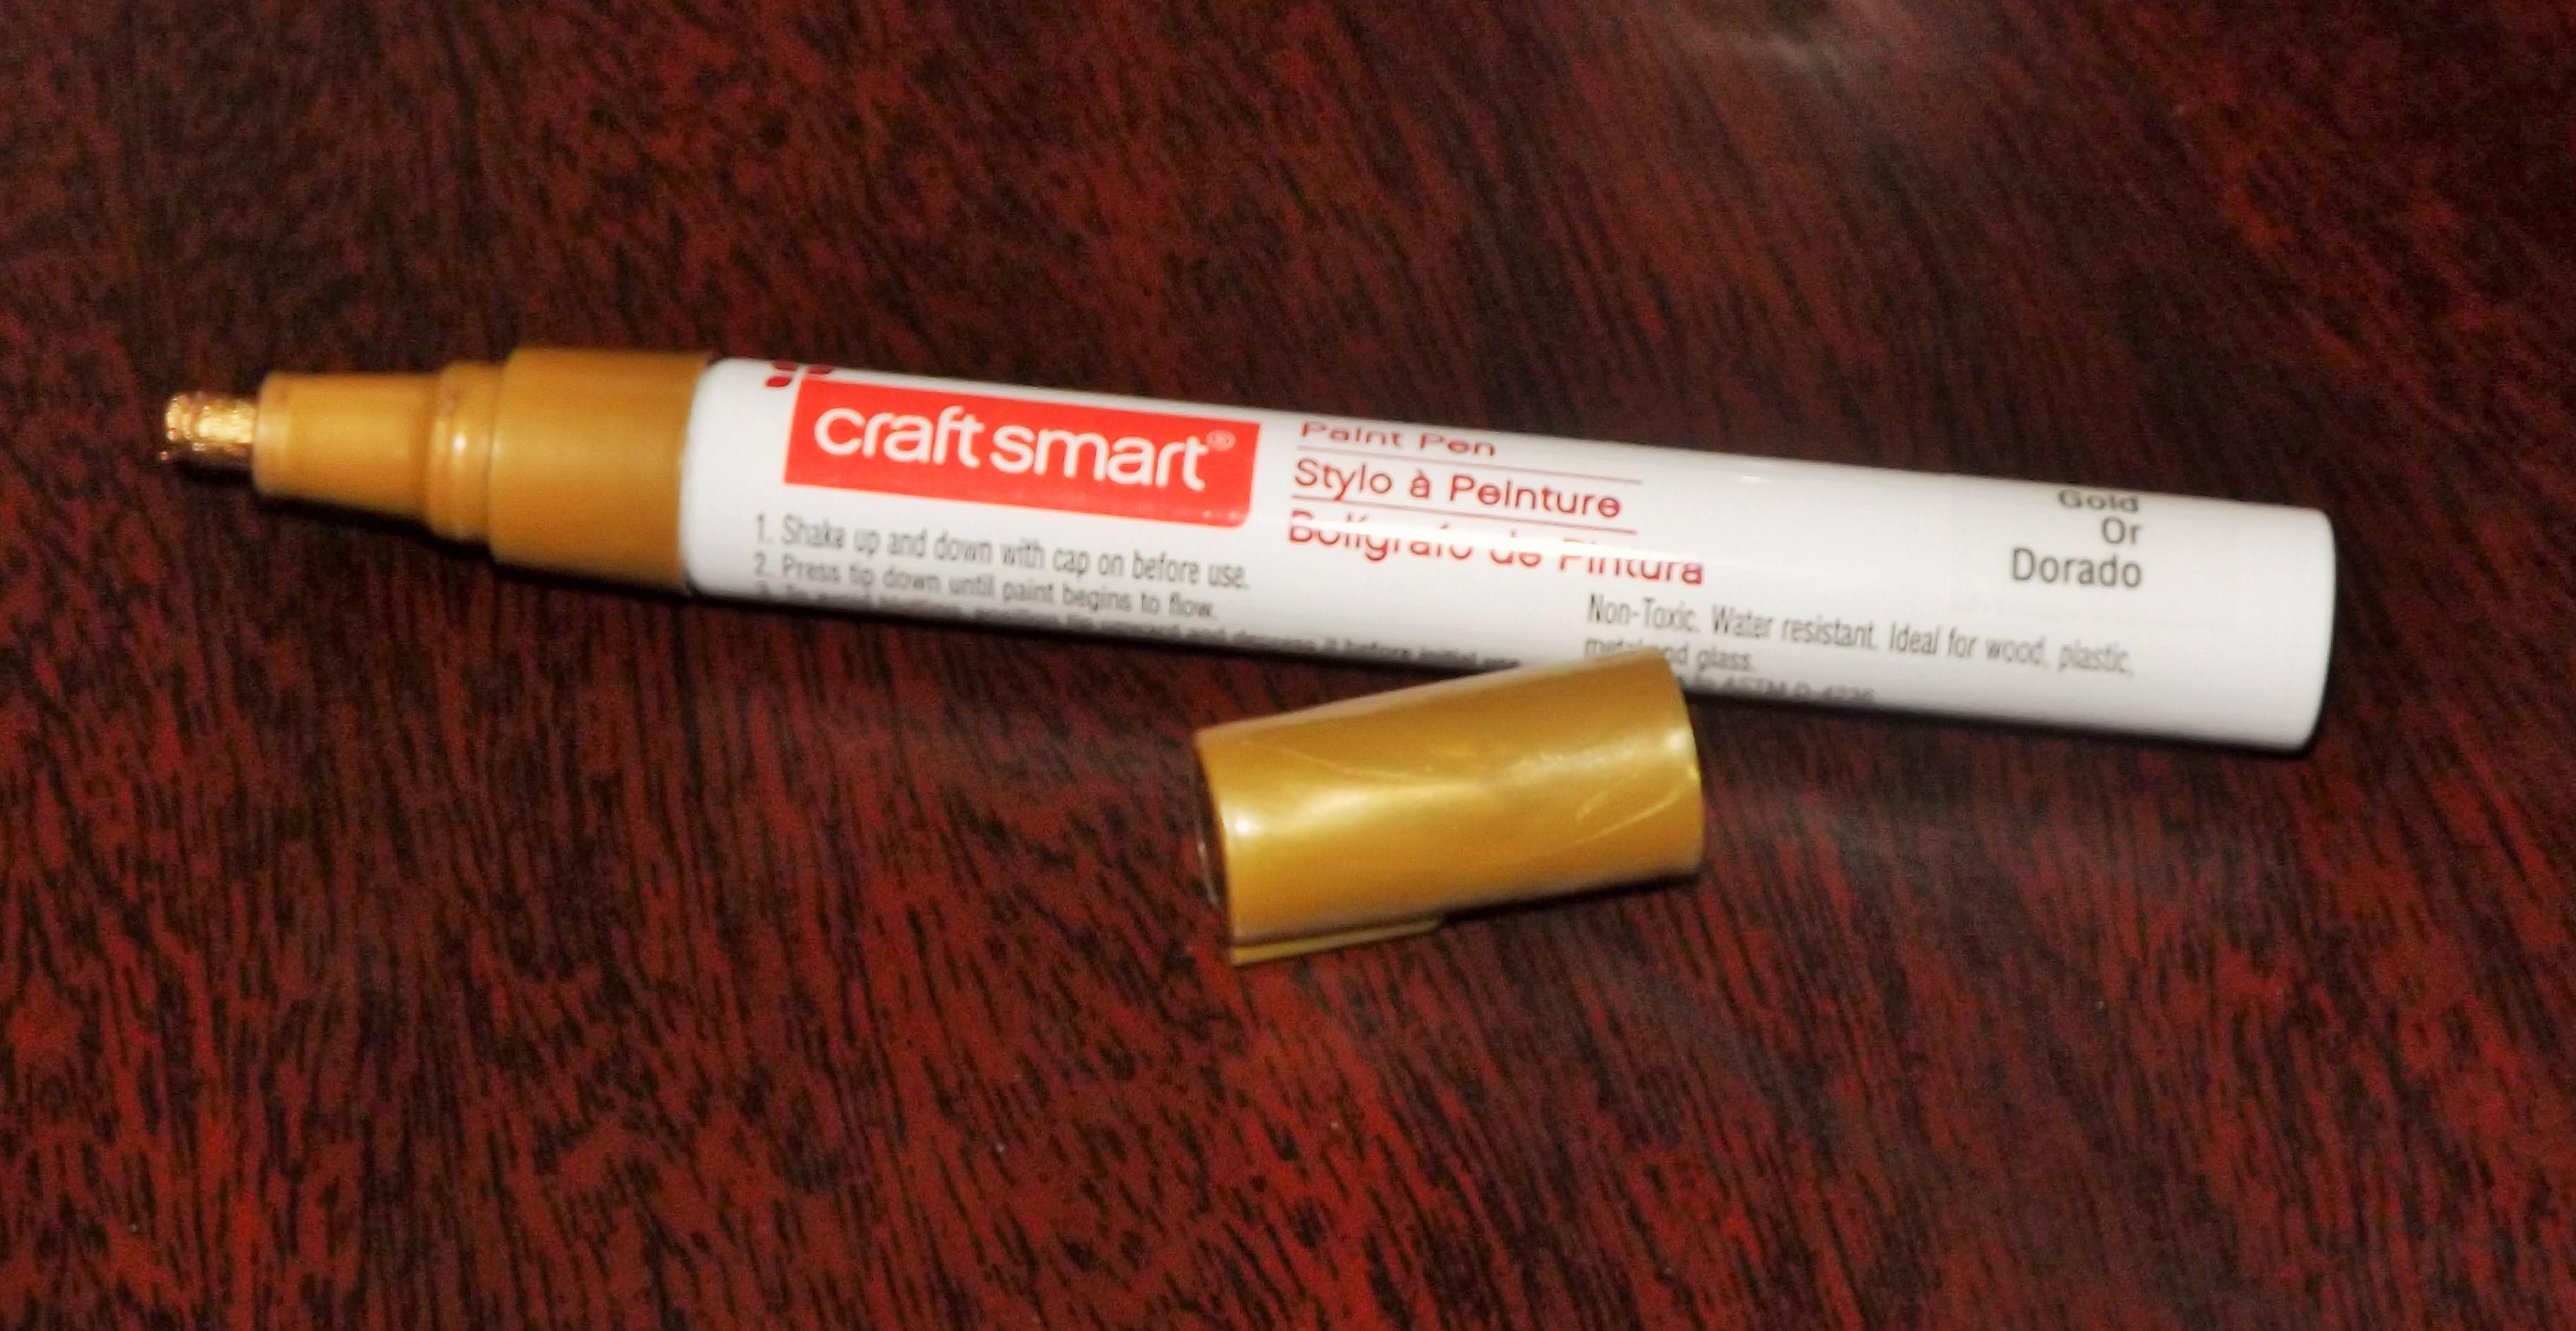 Painted mugs wonderful creations blog for Craft smart paint pen on mugs